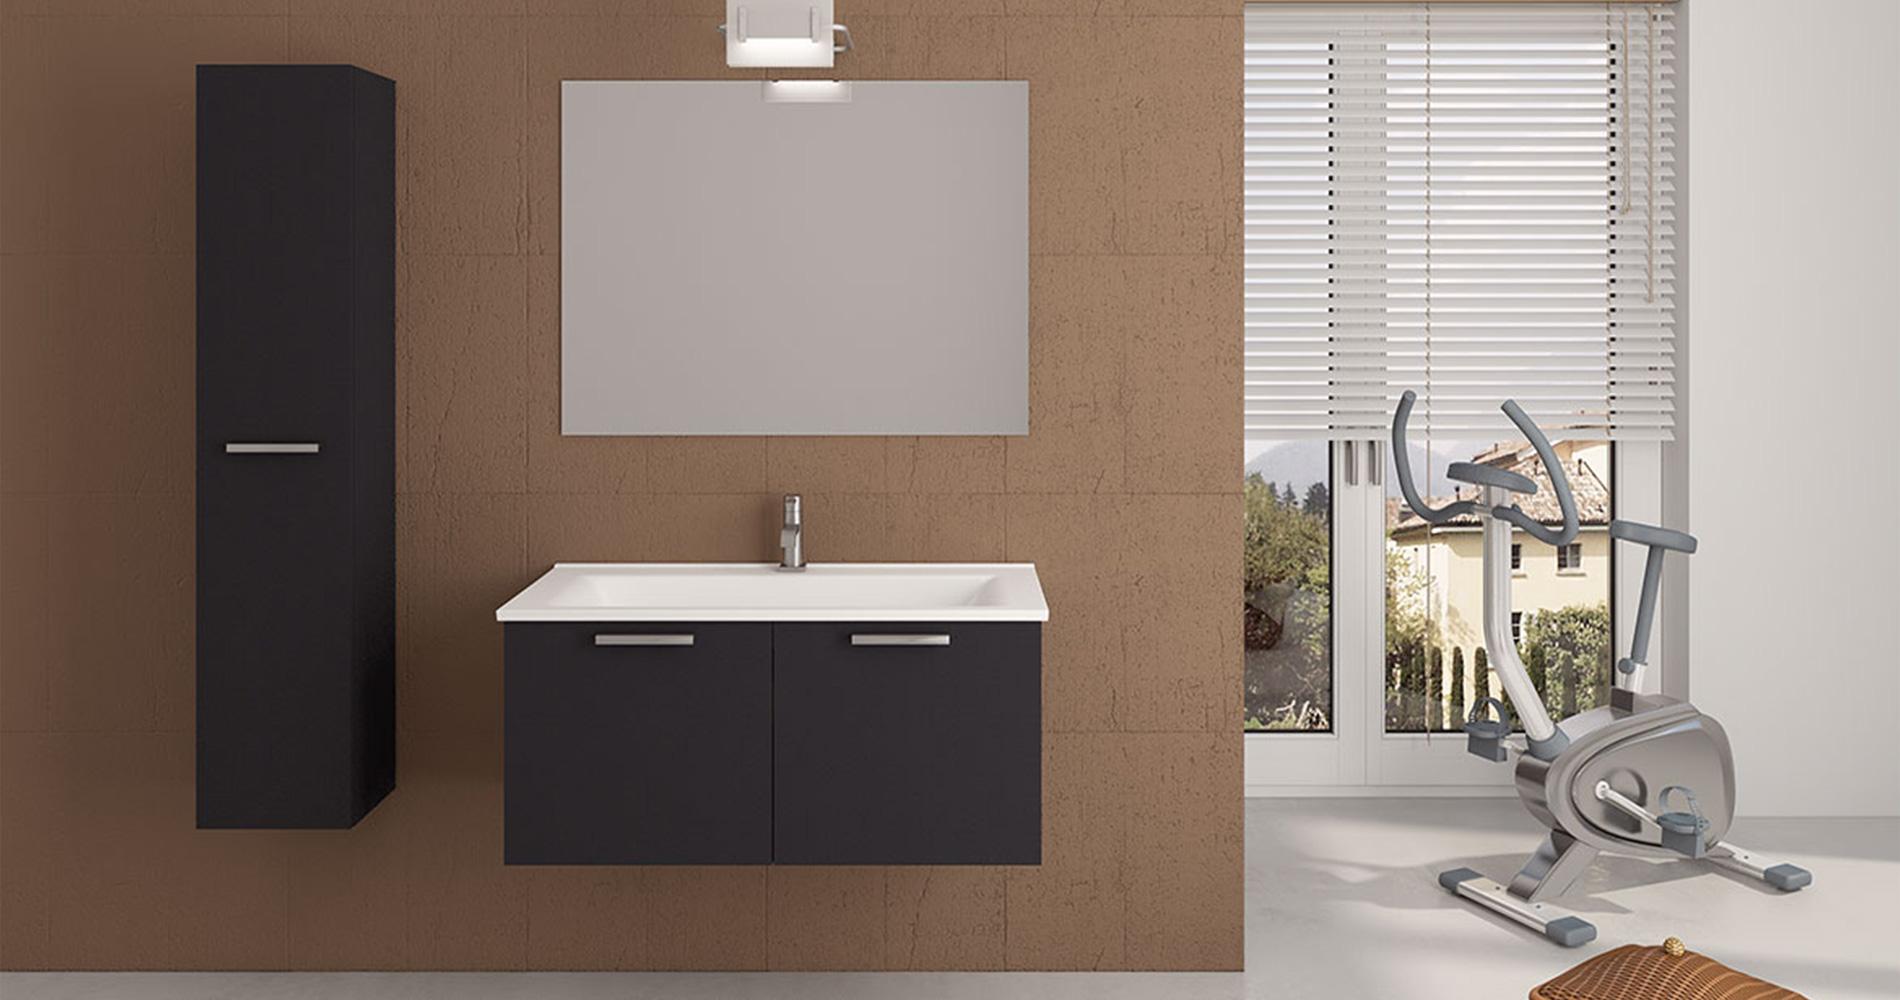 Superior quality bathroom vanity unit